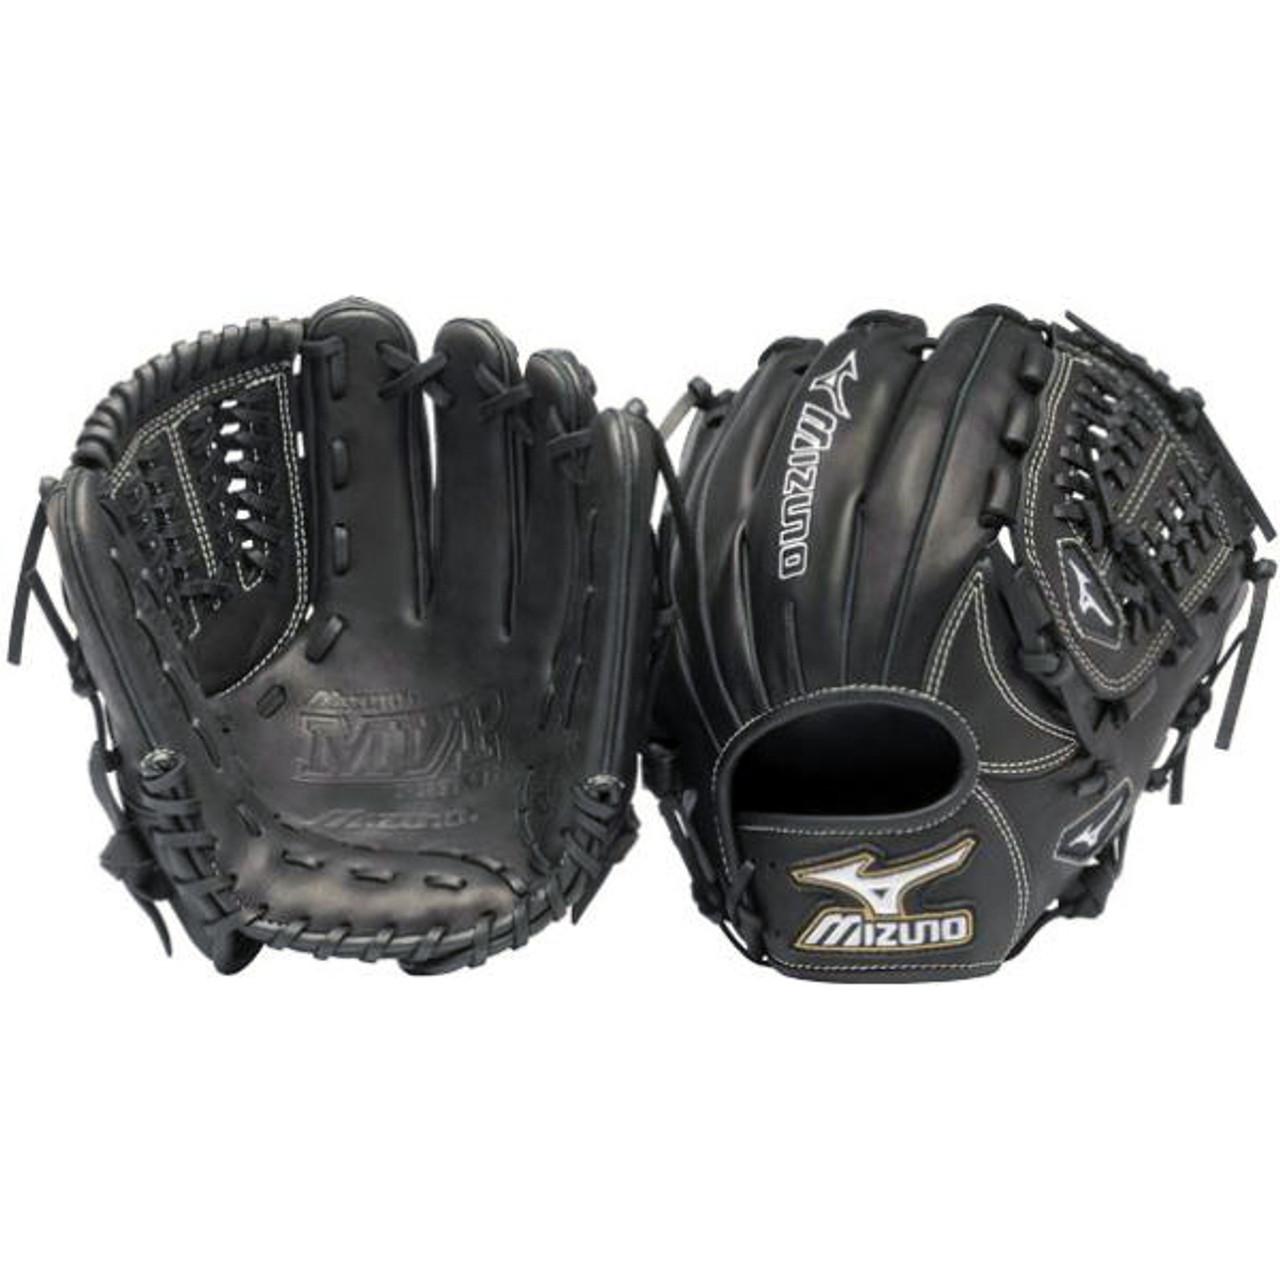 5b13be4763f Mizuno MVP Prime Infield   Pitcher Baseball Glove 11.5